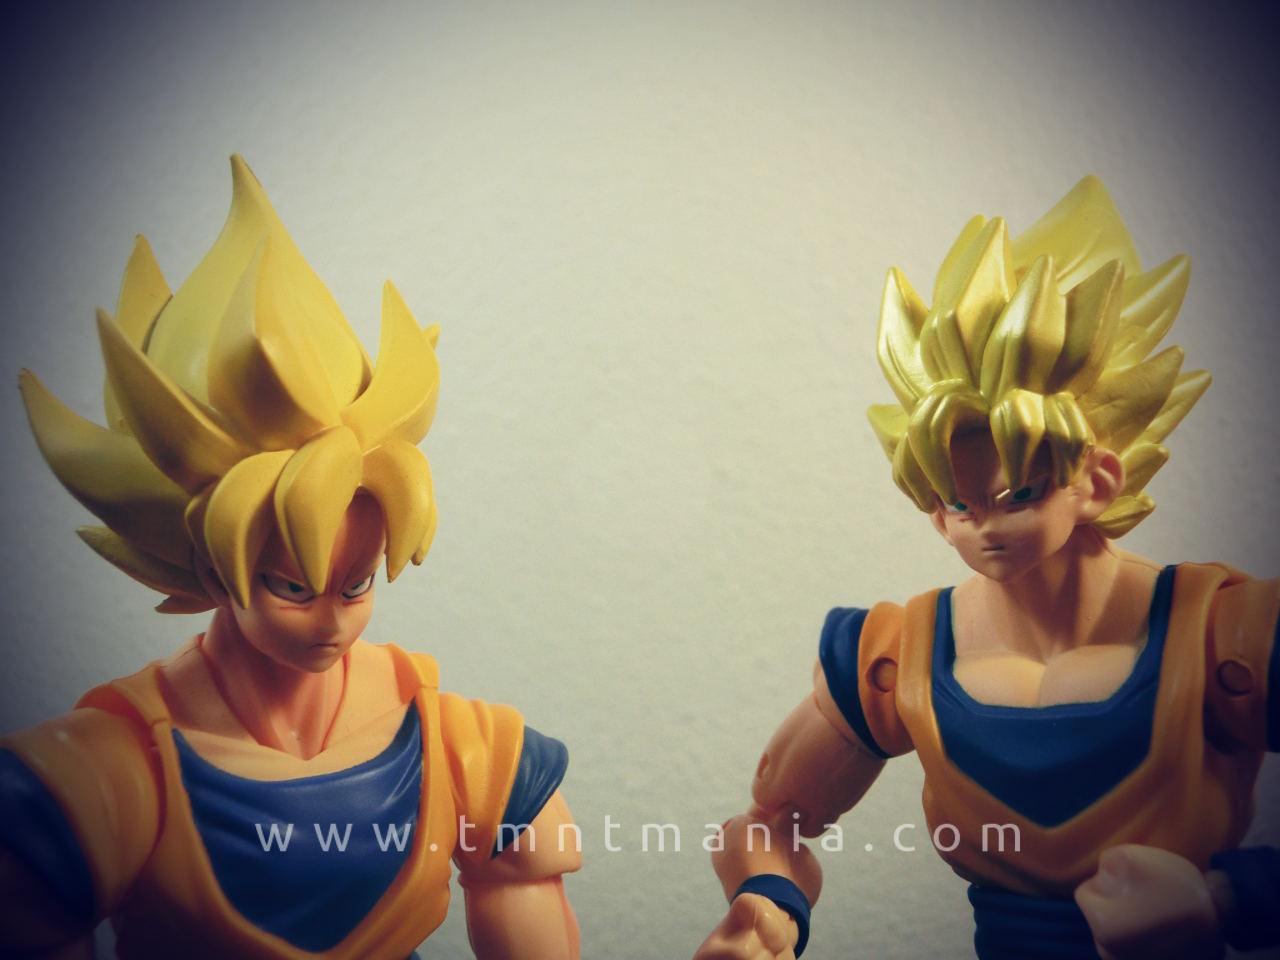 Comparativa de las figuras de Goku